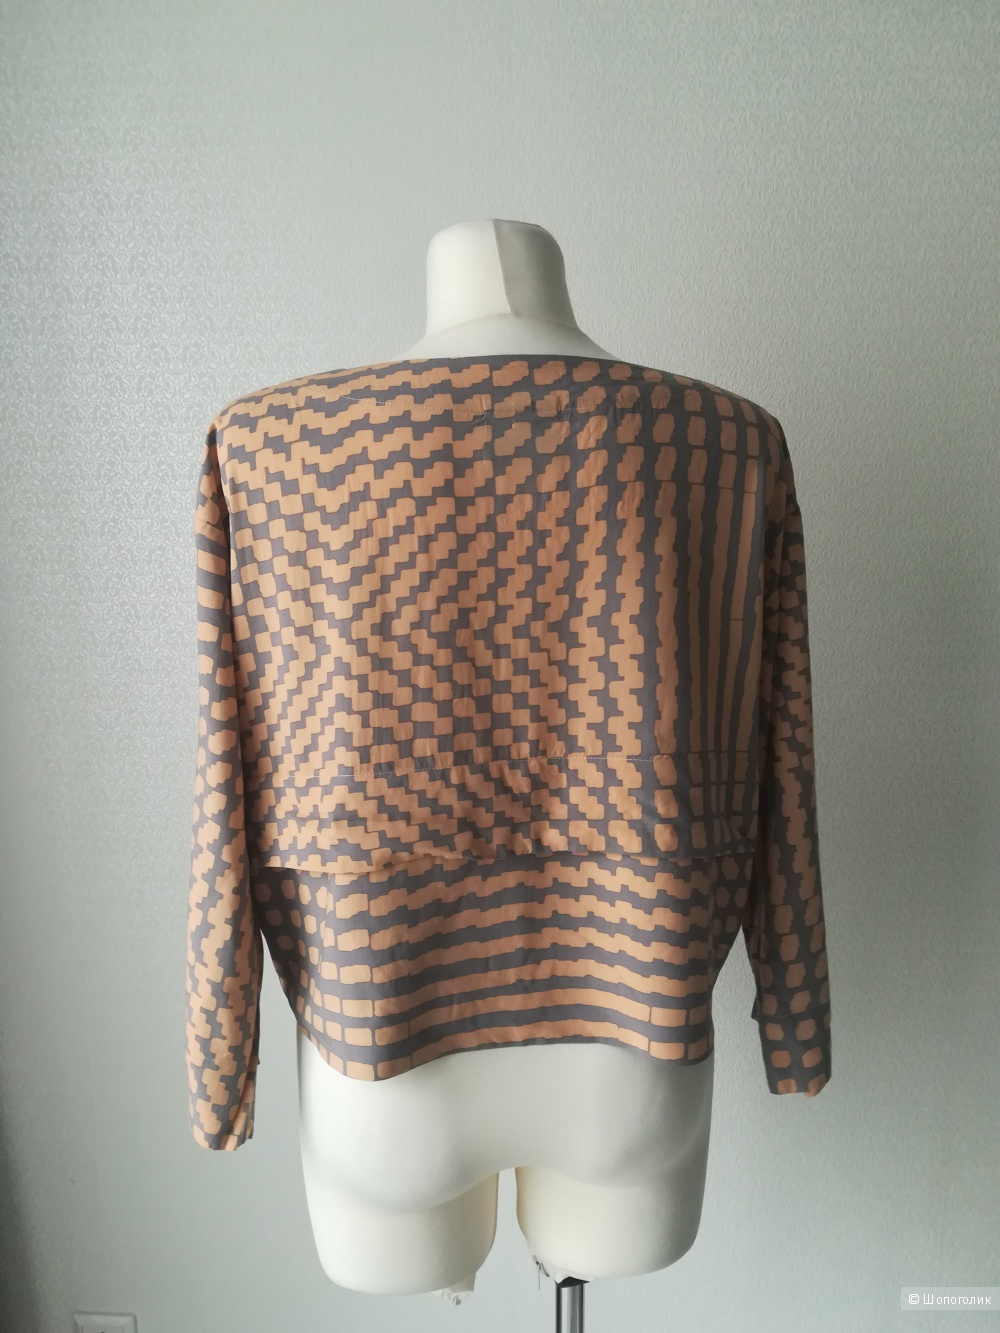 Блузка Bitte kai rand, размер Оверсайз